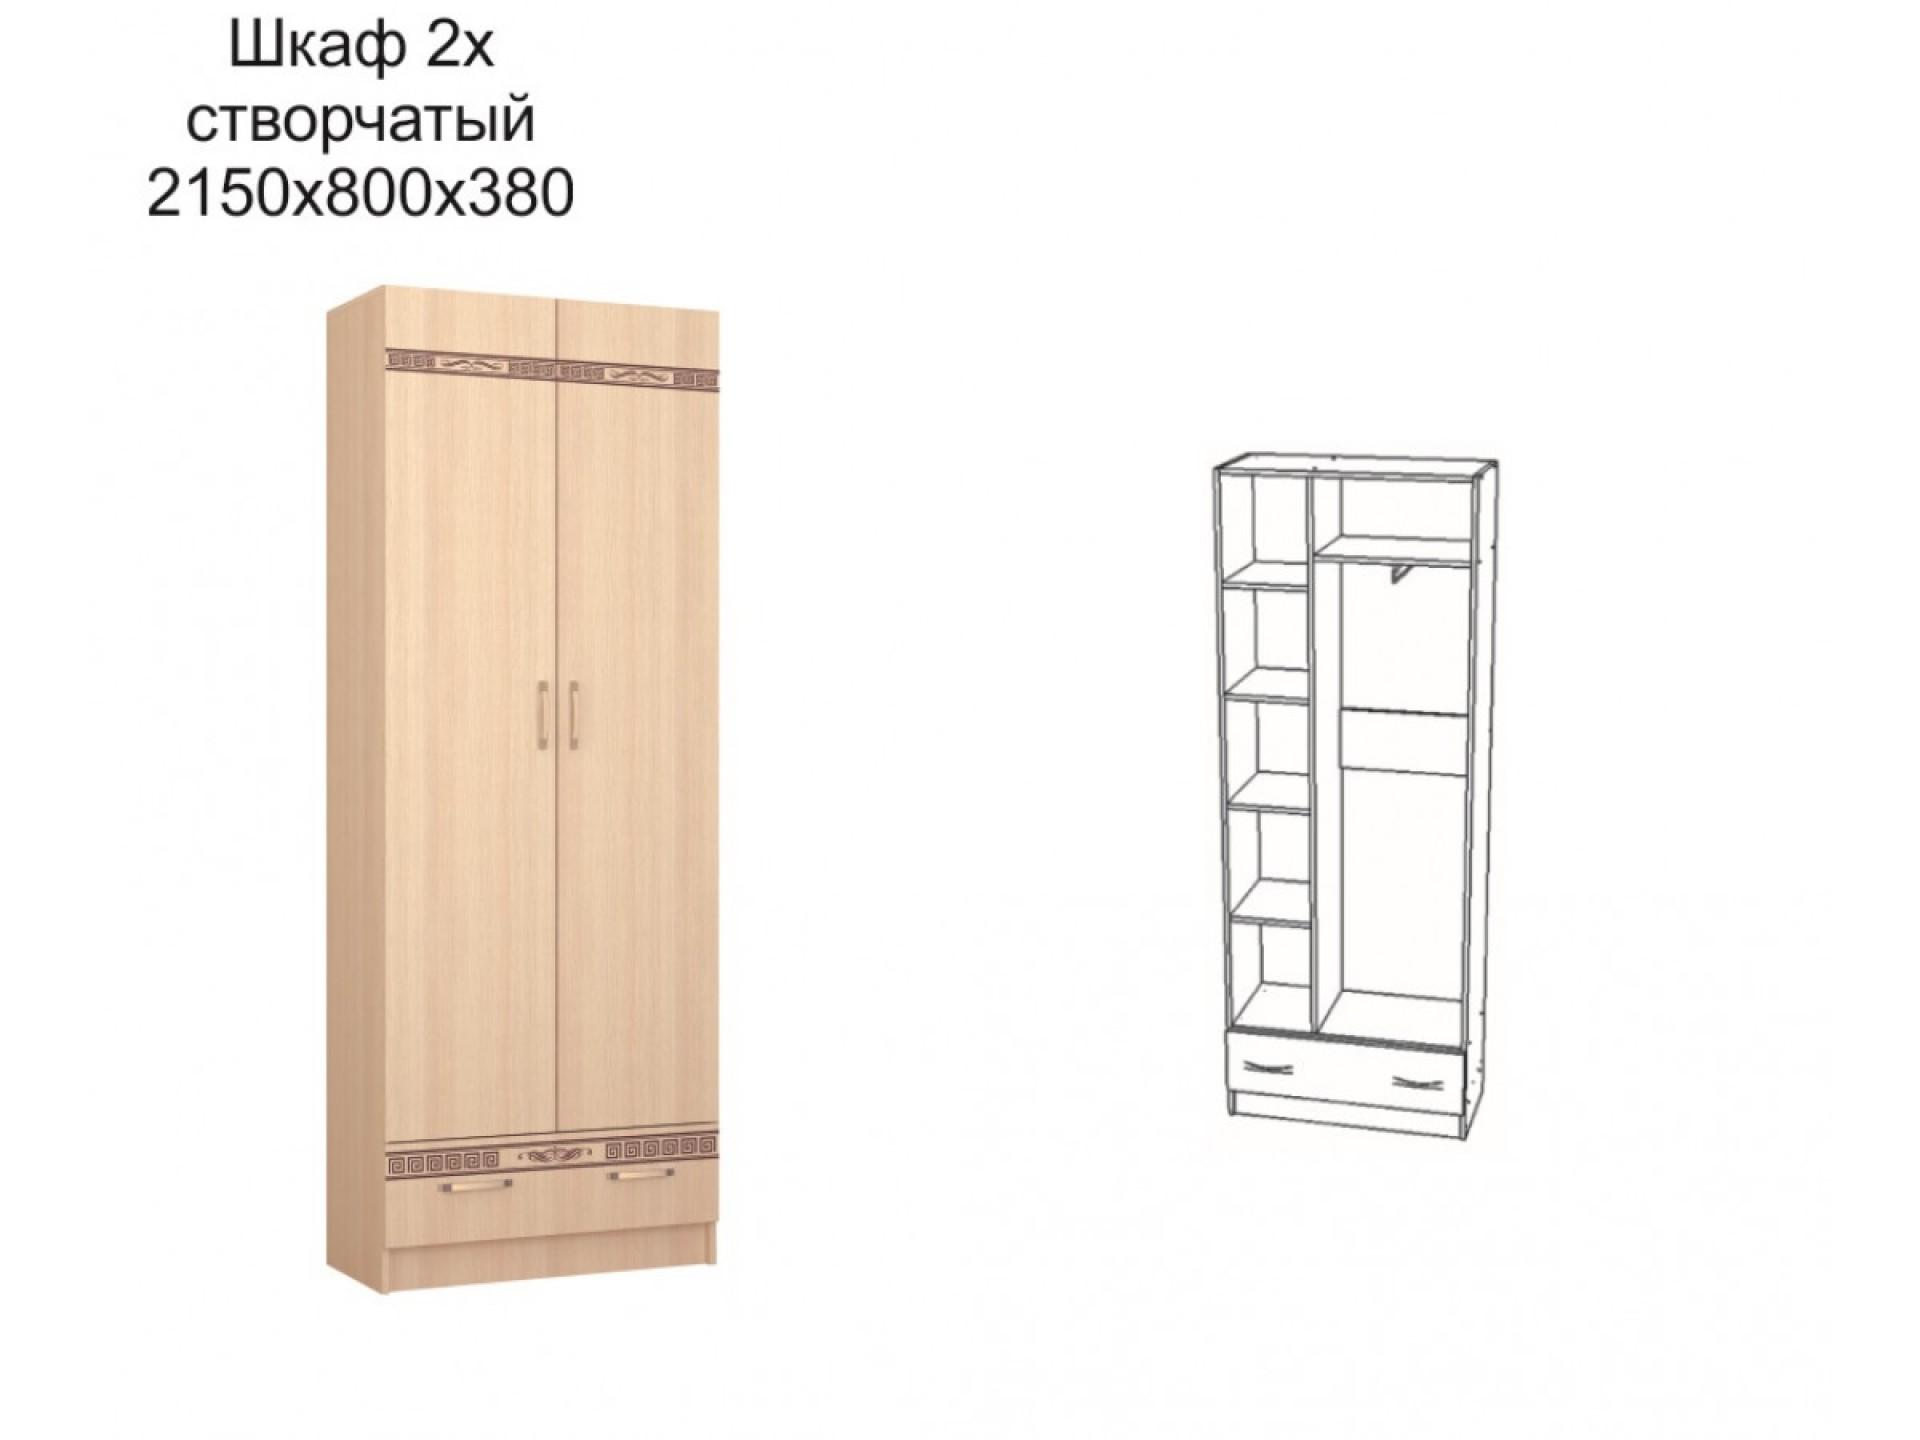 "Шкаф 2-х створчатый ""Фрегат"" приобрести в Томске"